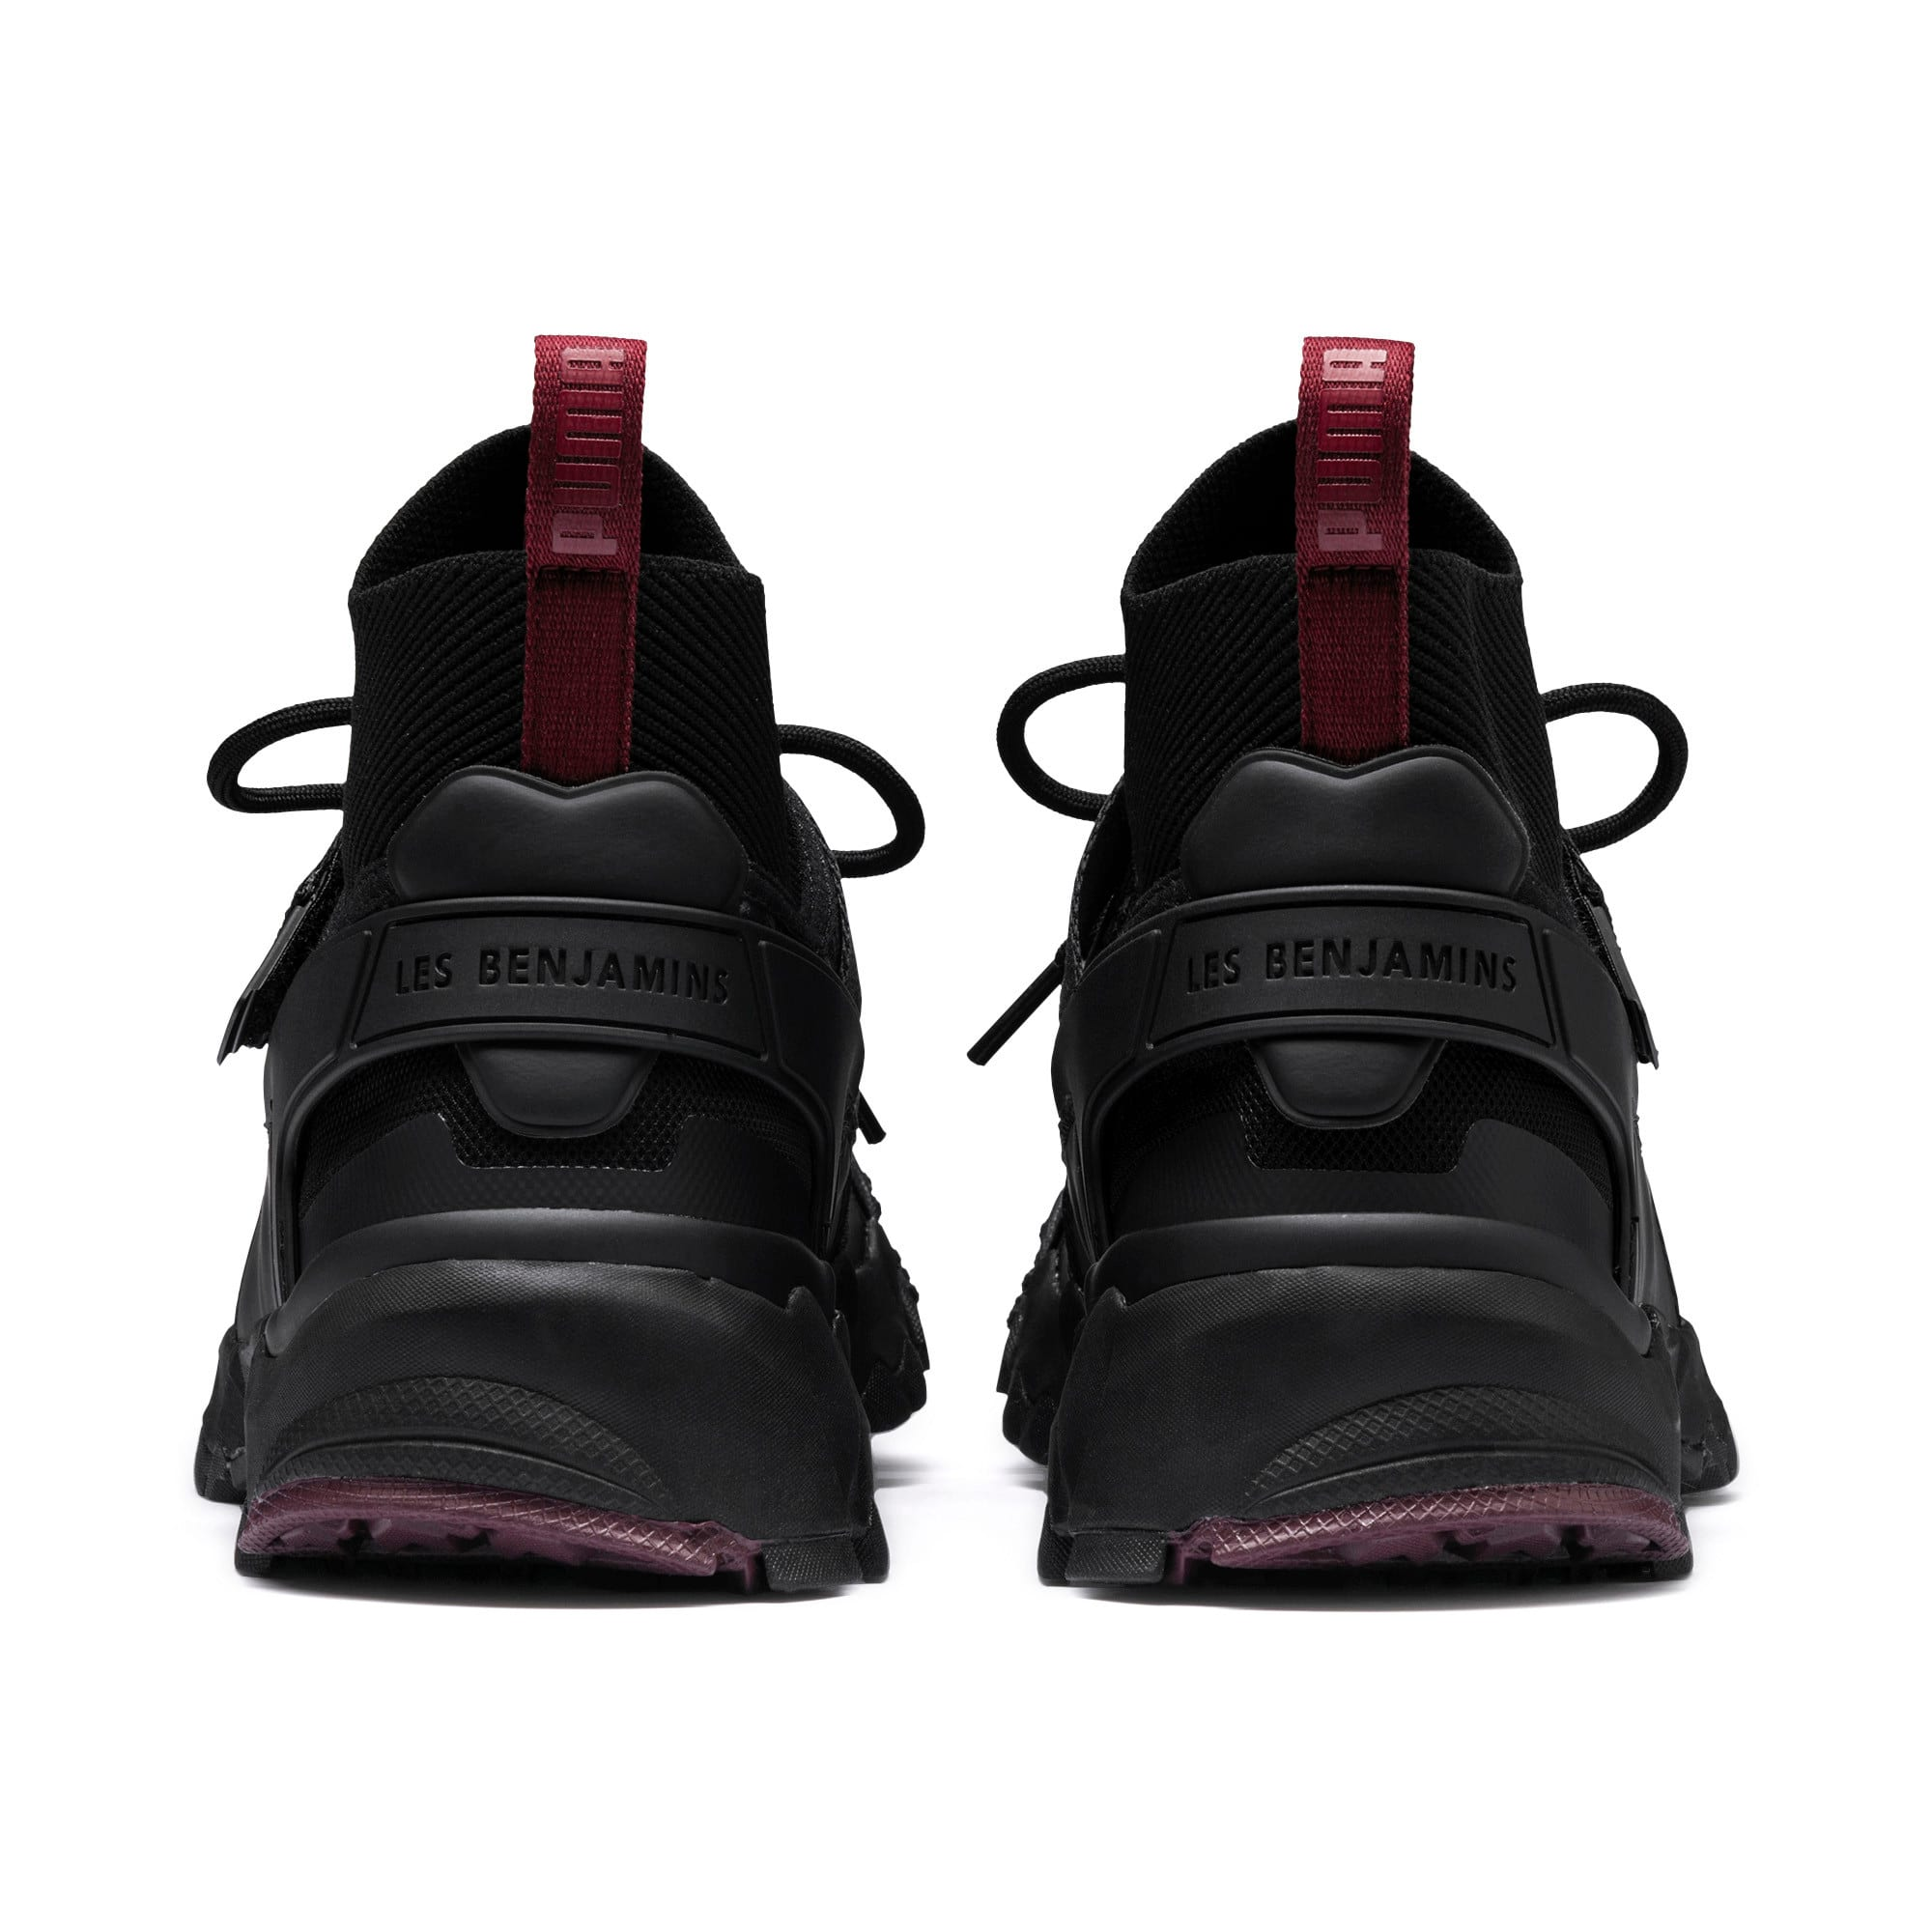 Thumbnail 4 of PUMA x LES BENJAMINS Trailfox Shoes, Puma Black, medium